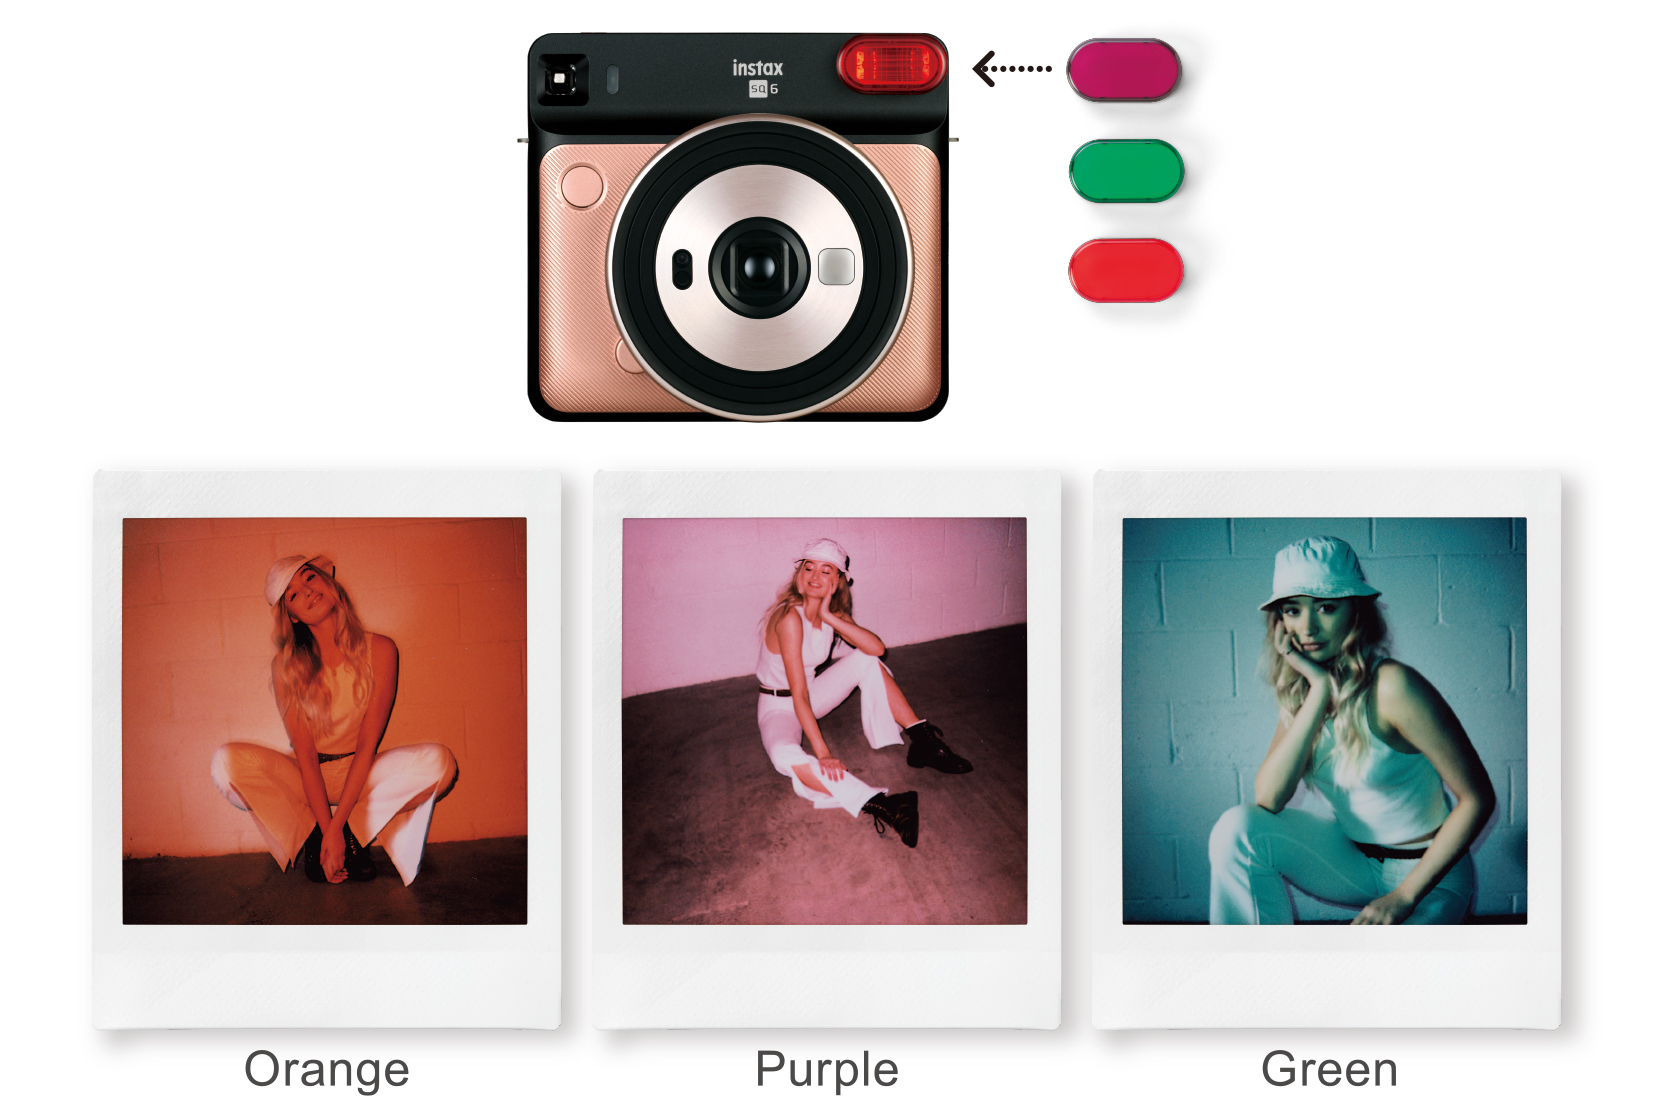 [photo] 3 Sample photo of the flash color filters (orange, purple, green) attachments for Instax SQUARE SQ6